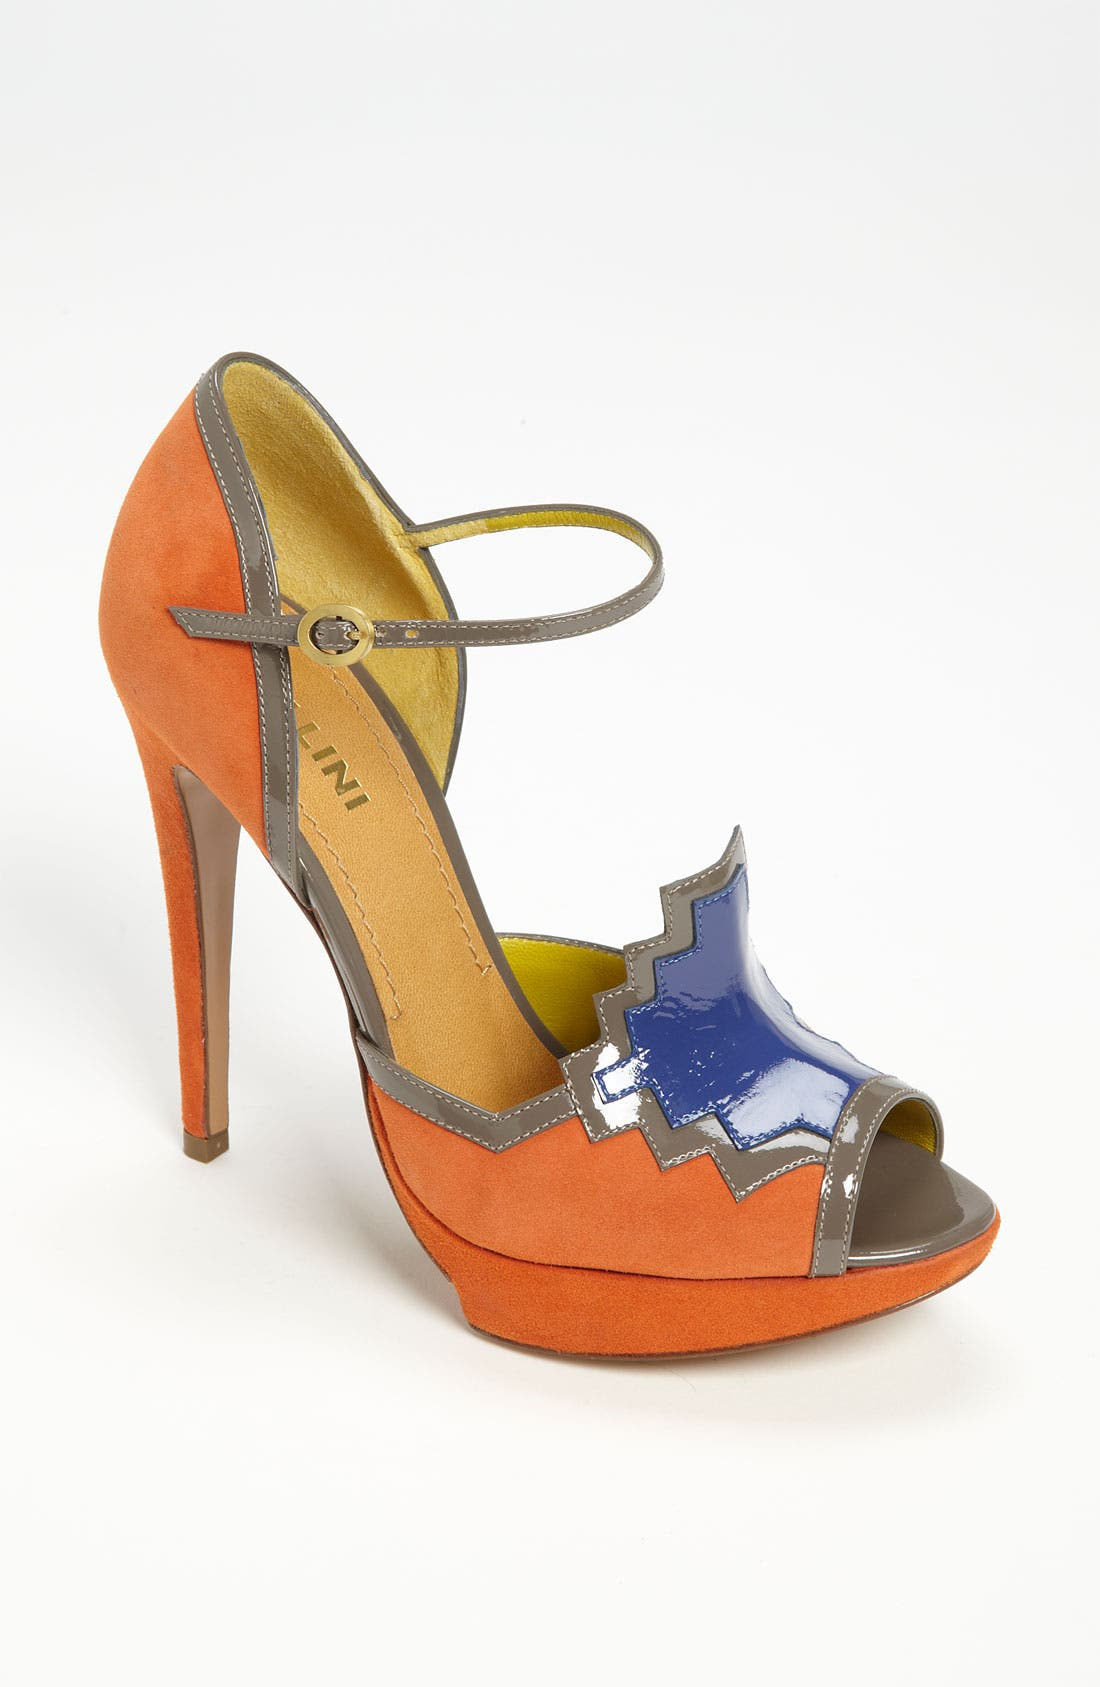 Main Image - Pollini Ankle Strap Pump